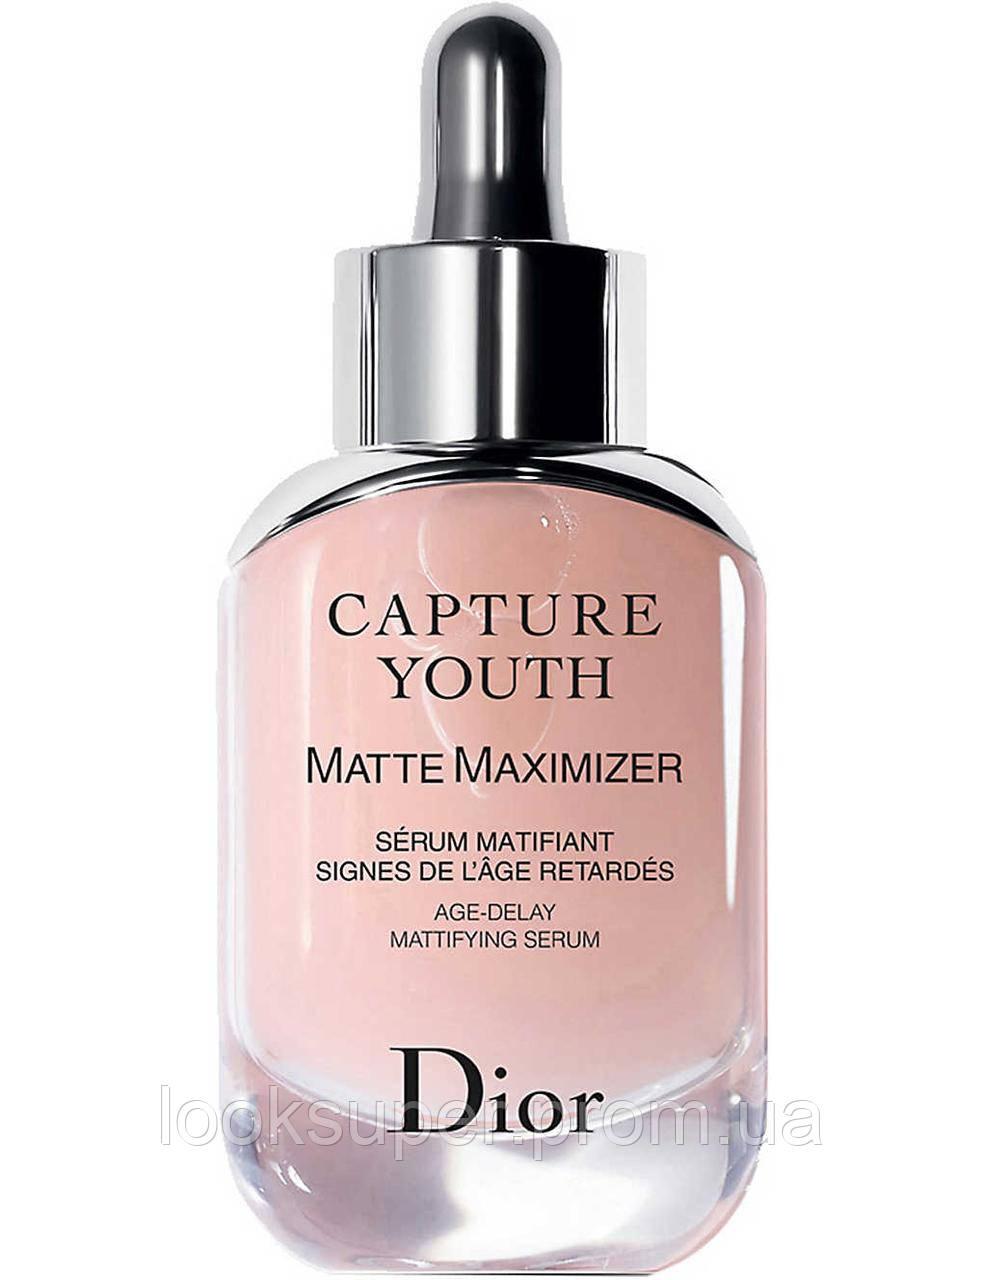 Сыворотка для матирования кожи DIOR Capture Youth Matte Maximizer Age-delay Matifying Serum (30ml)